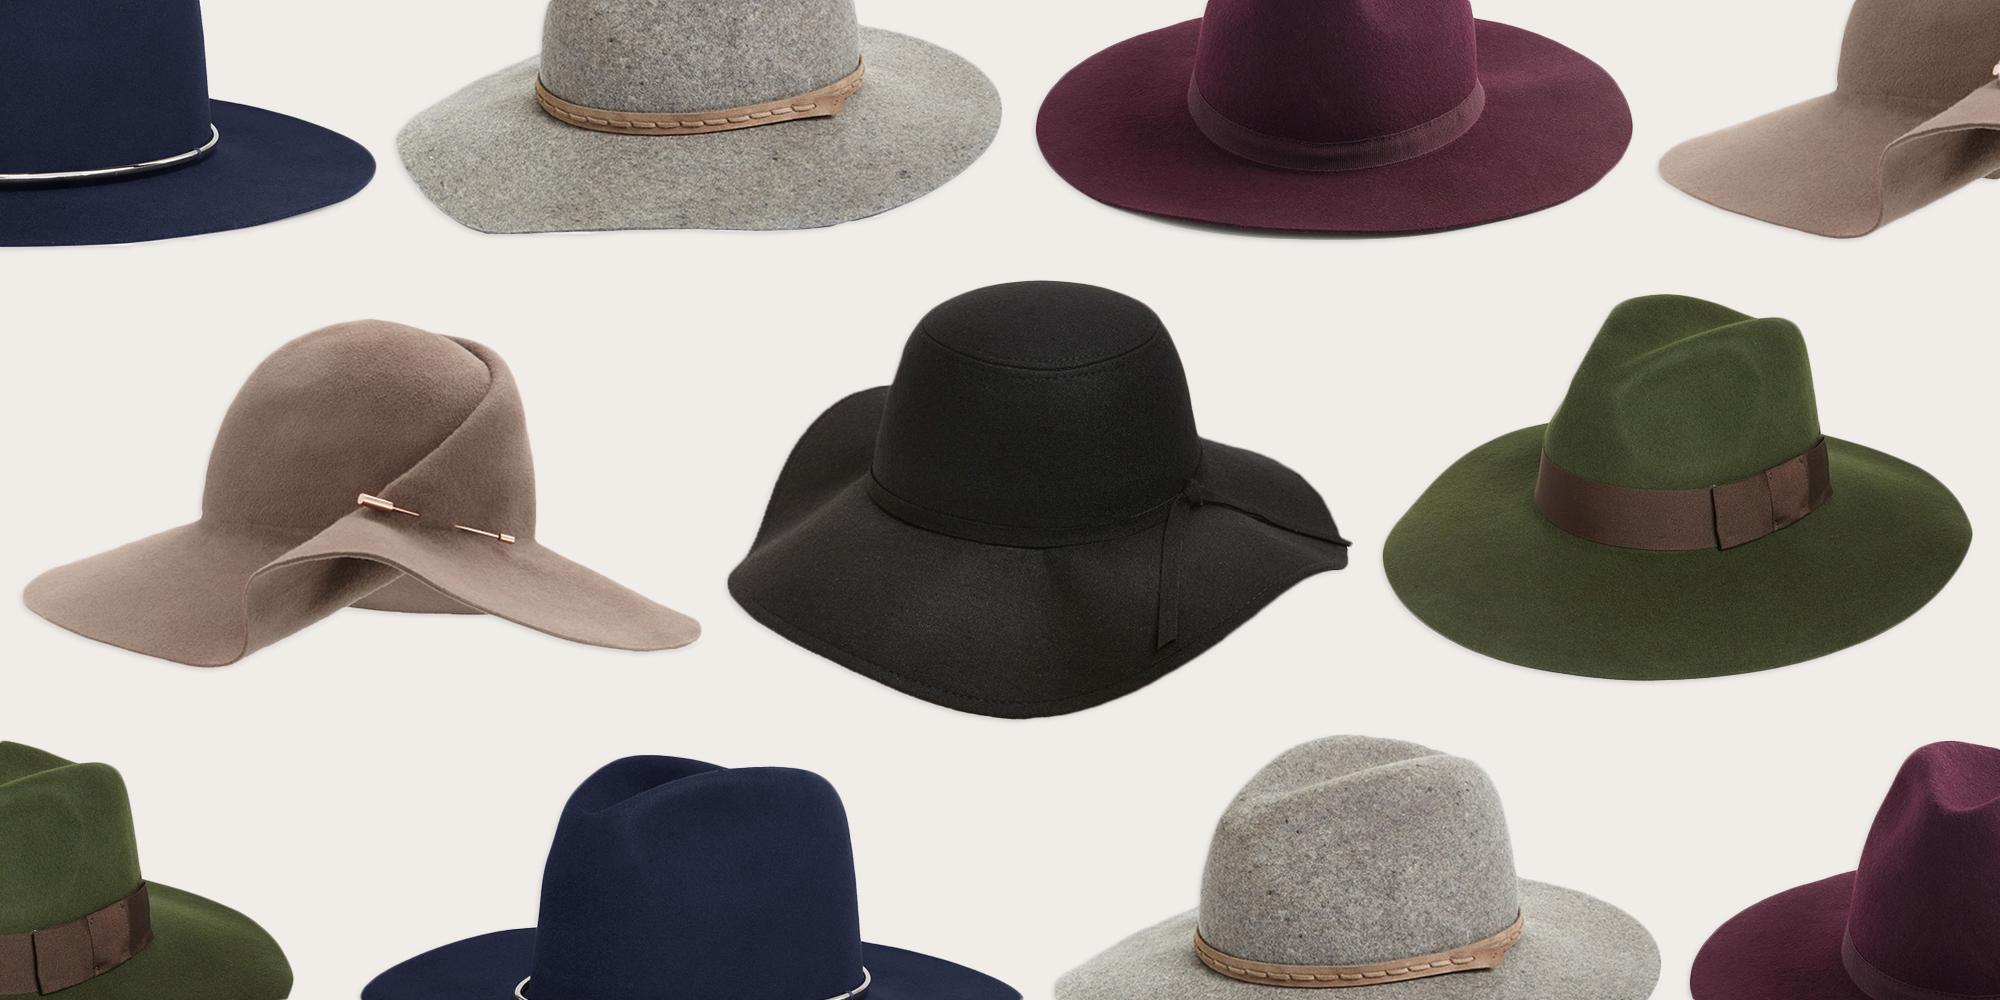 10 best felt hats for winter 2017 fedoras felt and